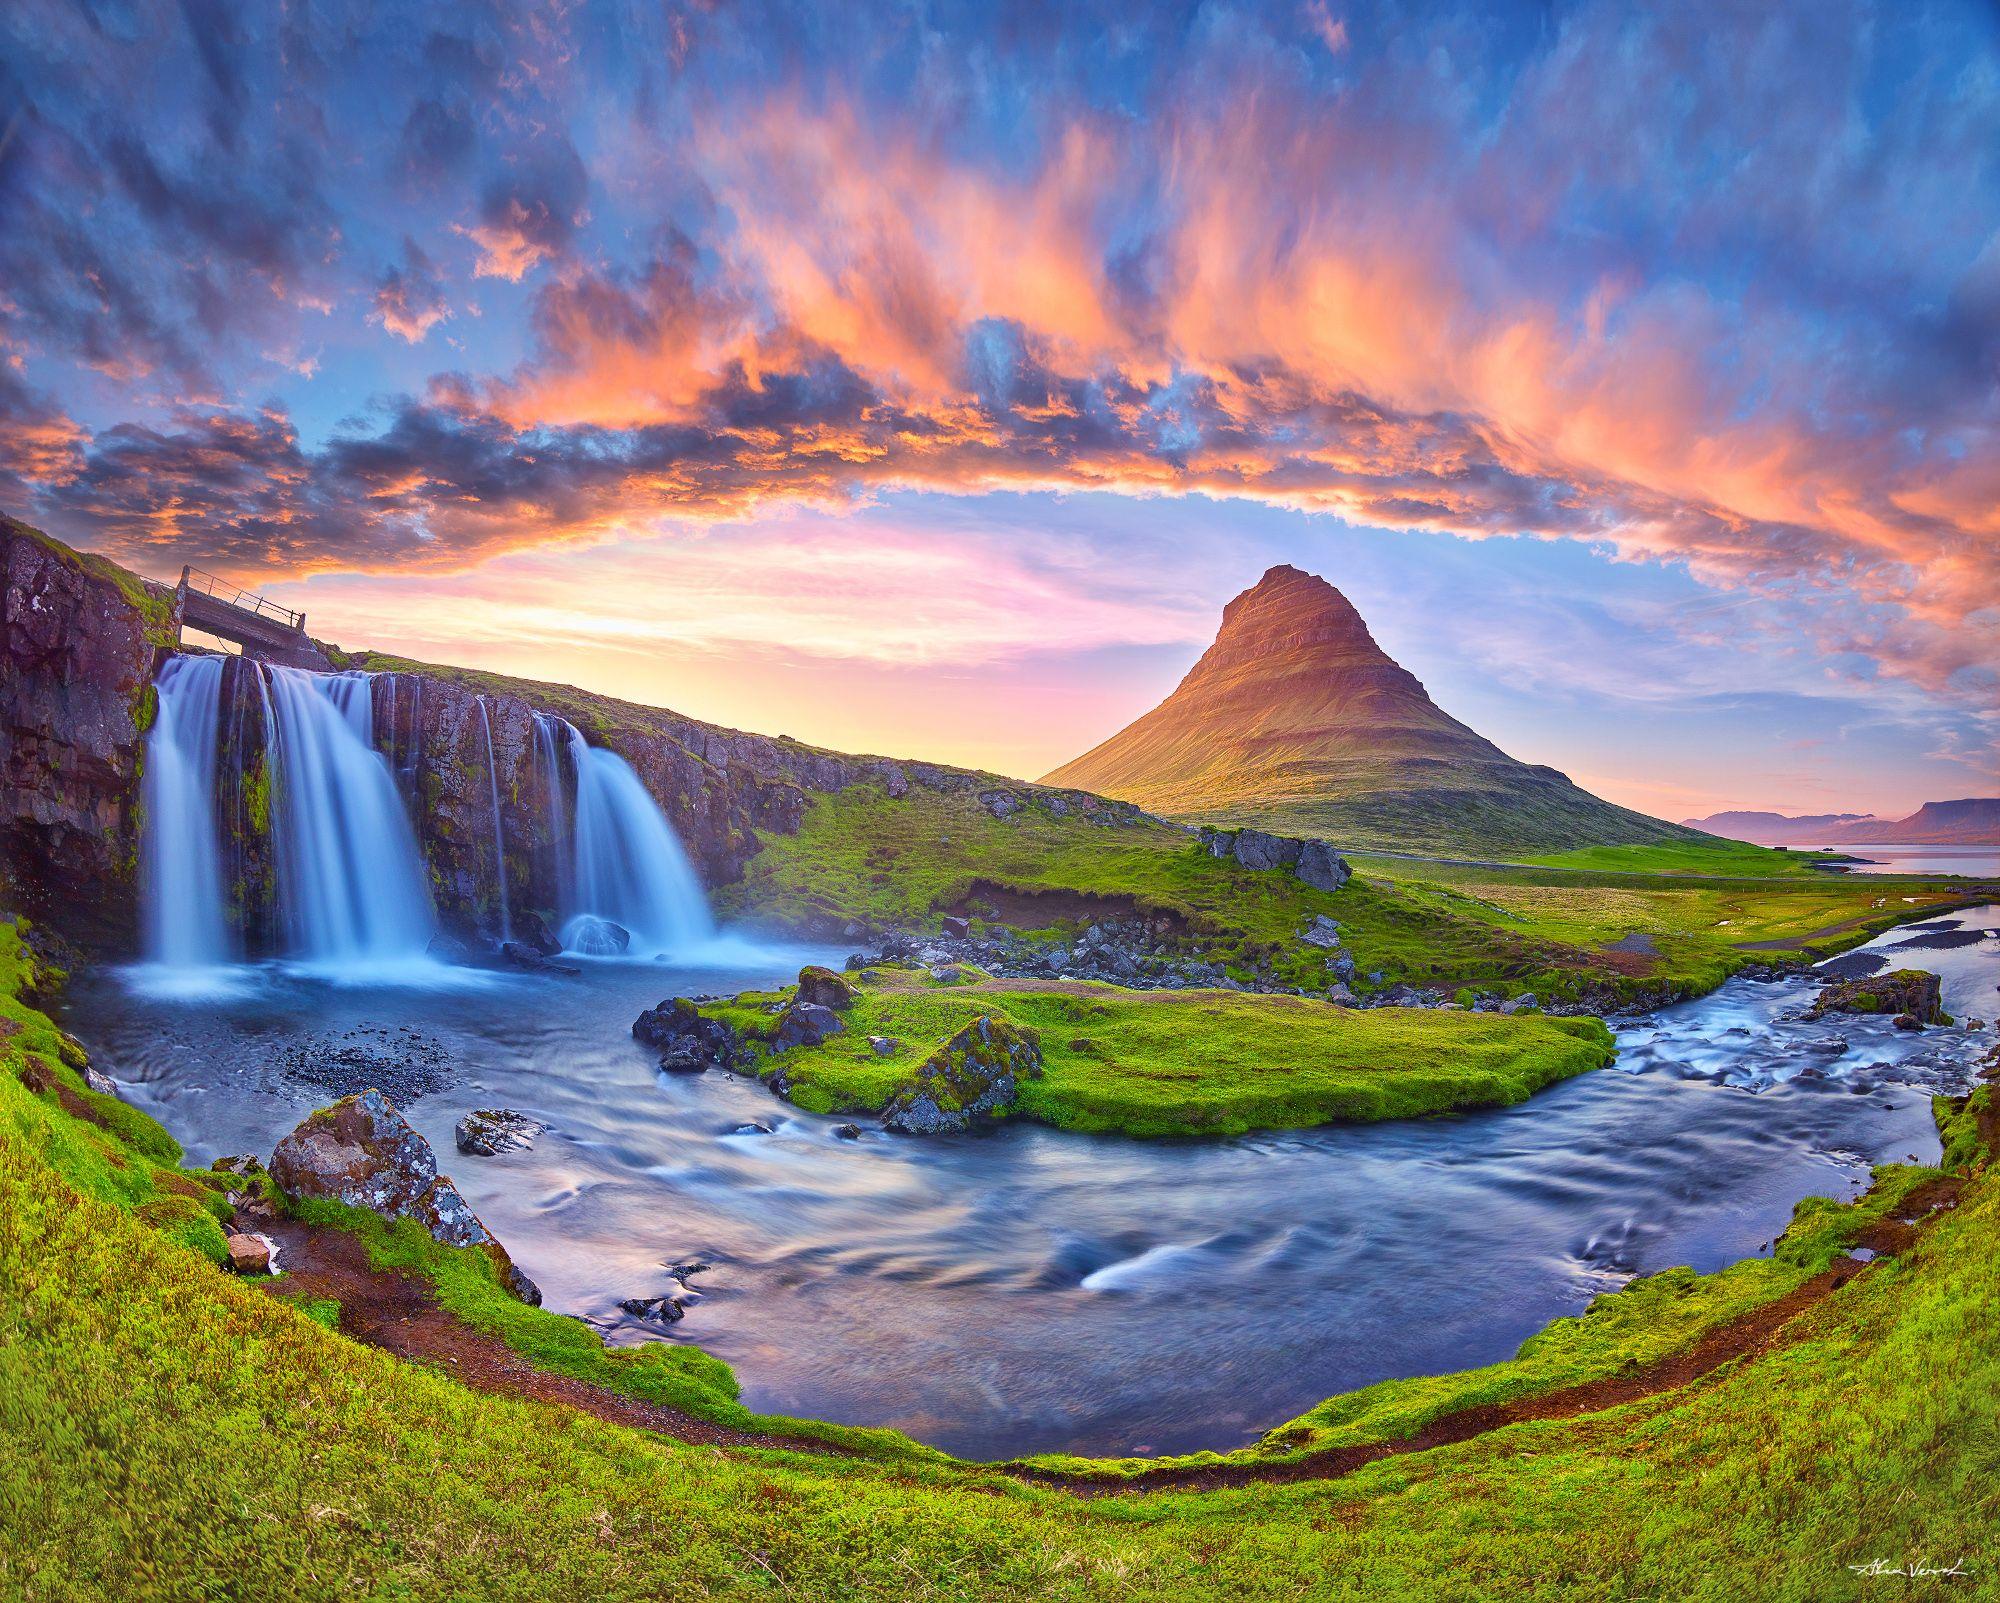 47 Vershinin Photography ideas | fine art landscape photography, landscape  photography, landscape